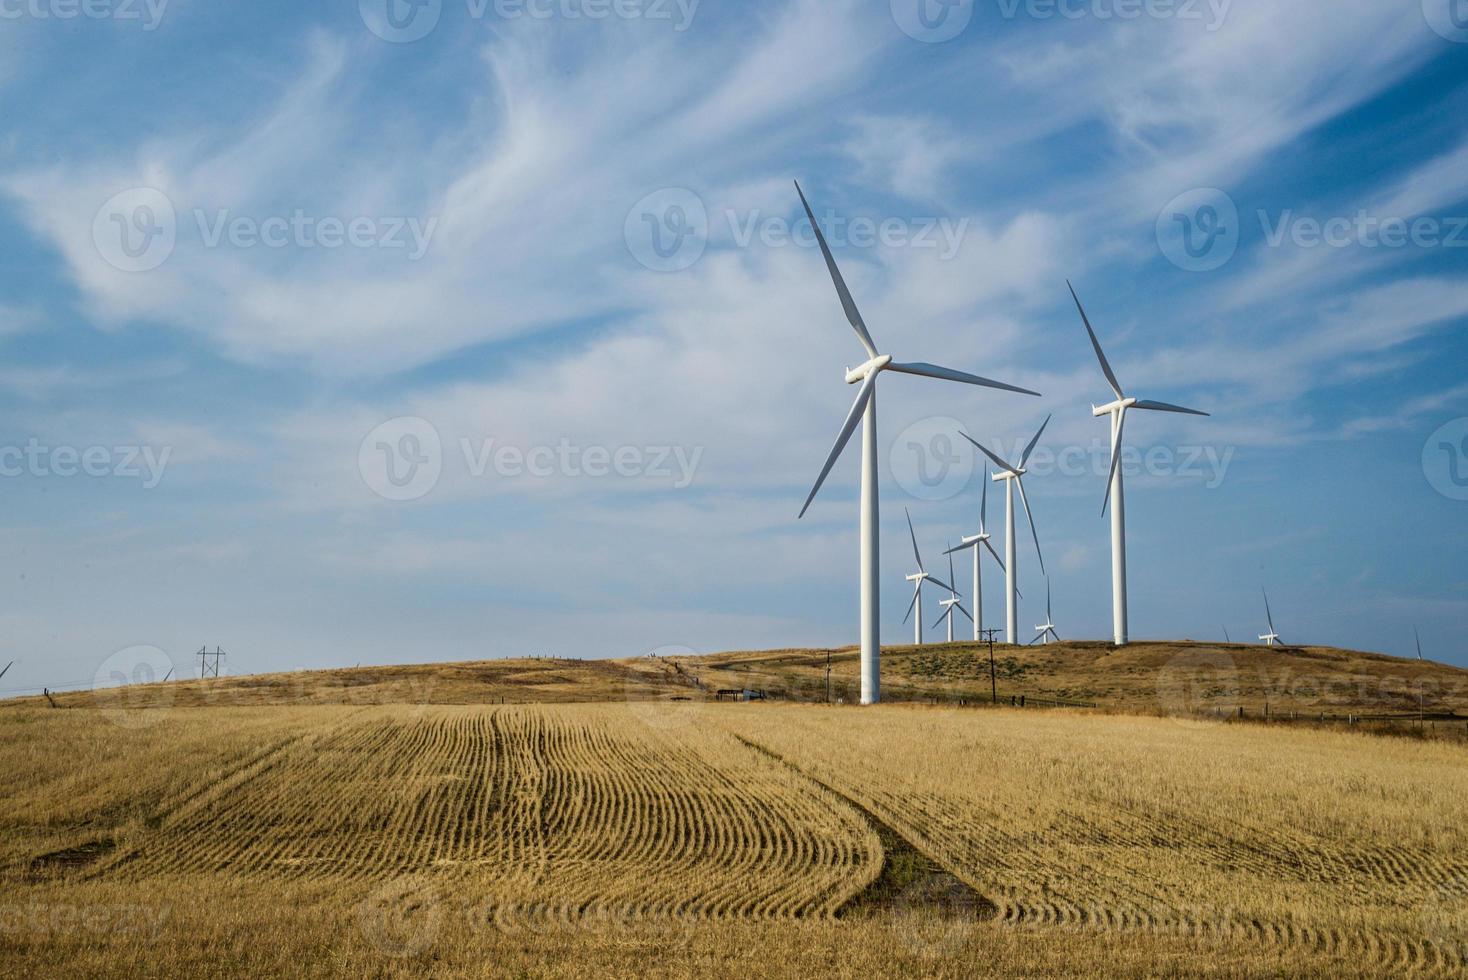 Turbines in wind farm photo